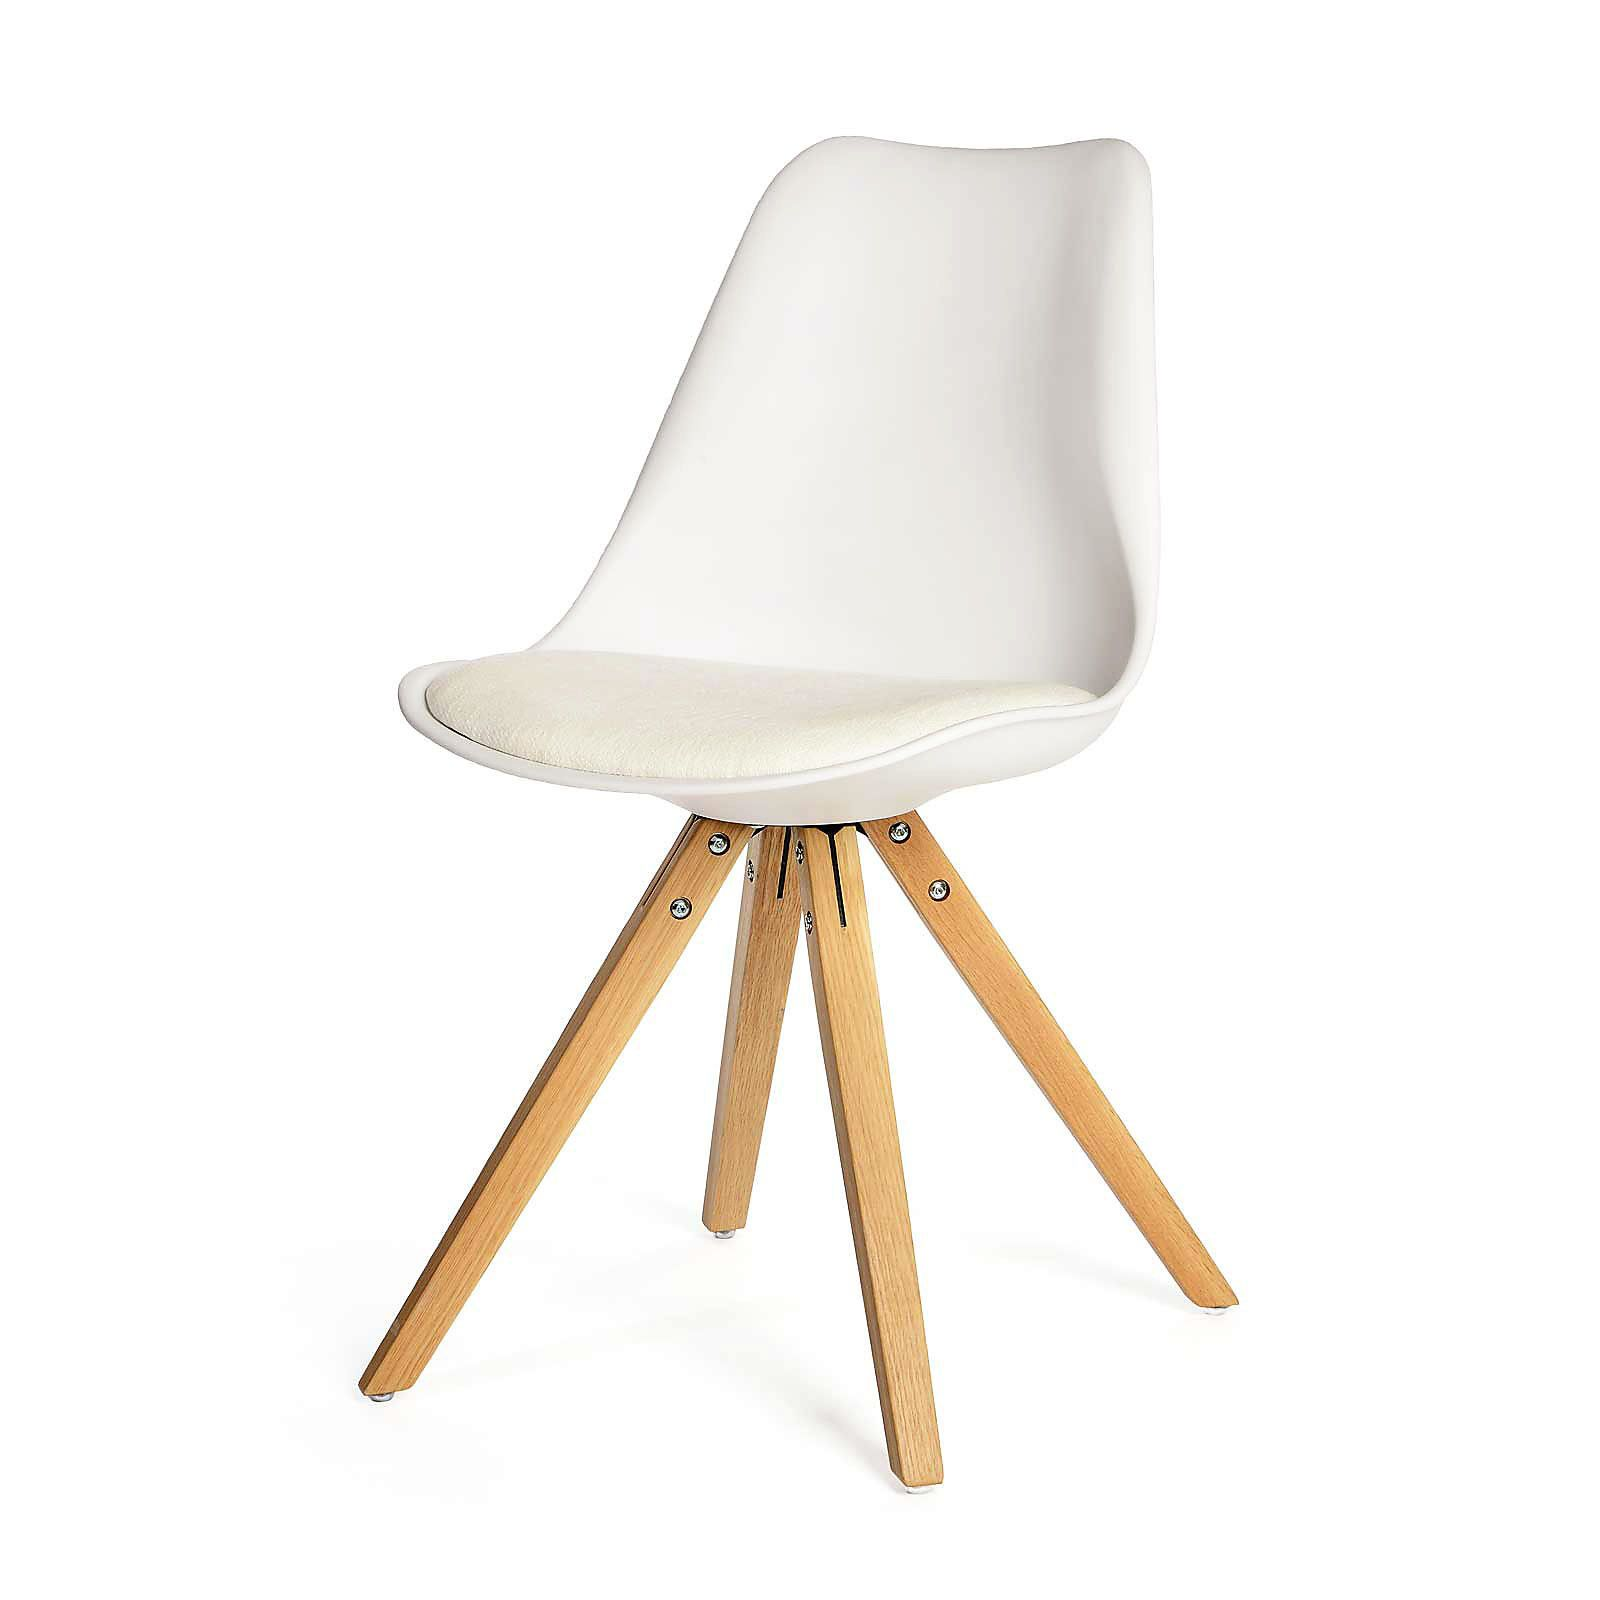 stuhl b 53 x h 83 x t 49cm wei weiss st hle pinterest. Black Bedroom Furniture Sets. Home Design Ideas